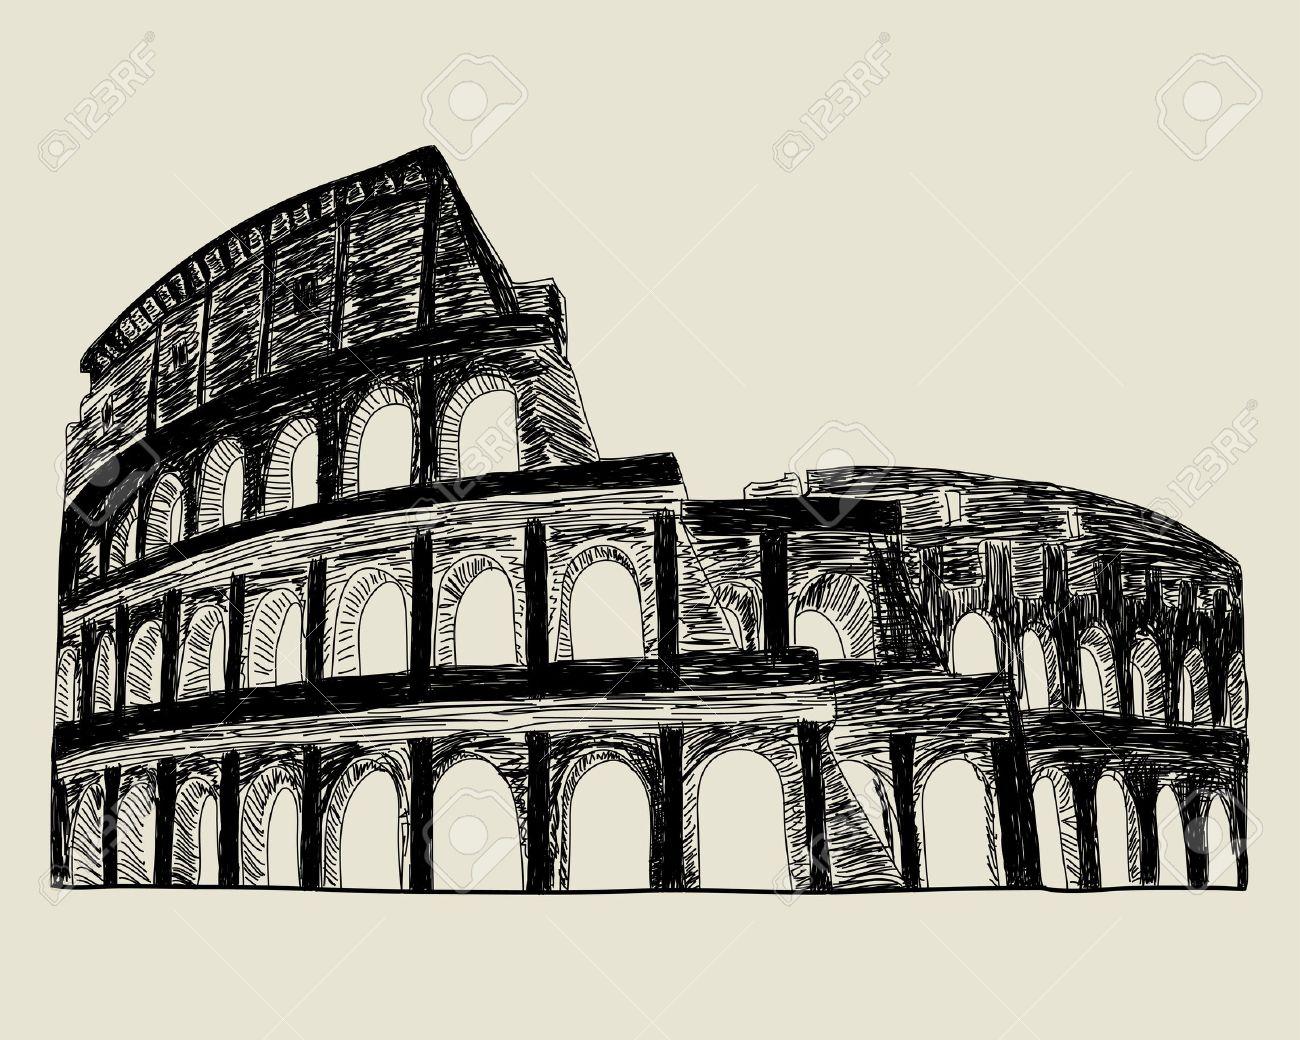 Roman Colosseum Drawing At GetDrawings.com